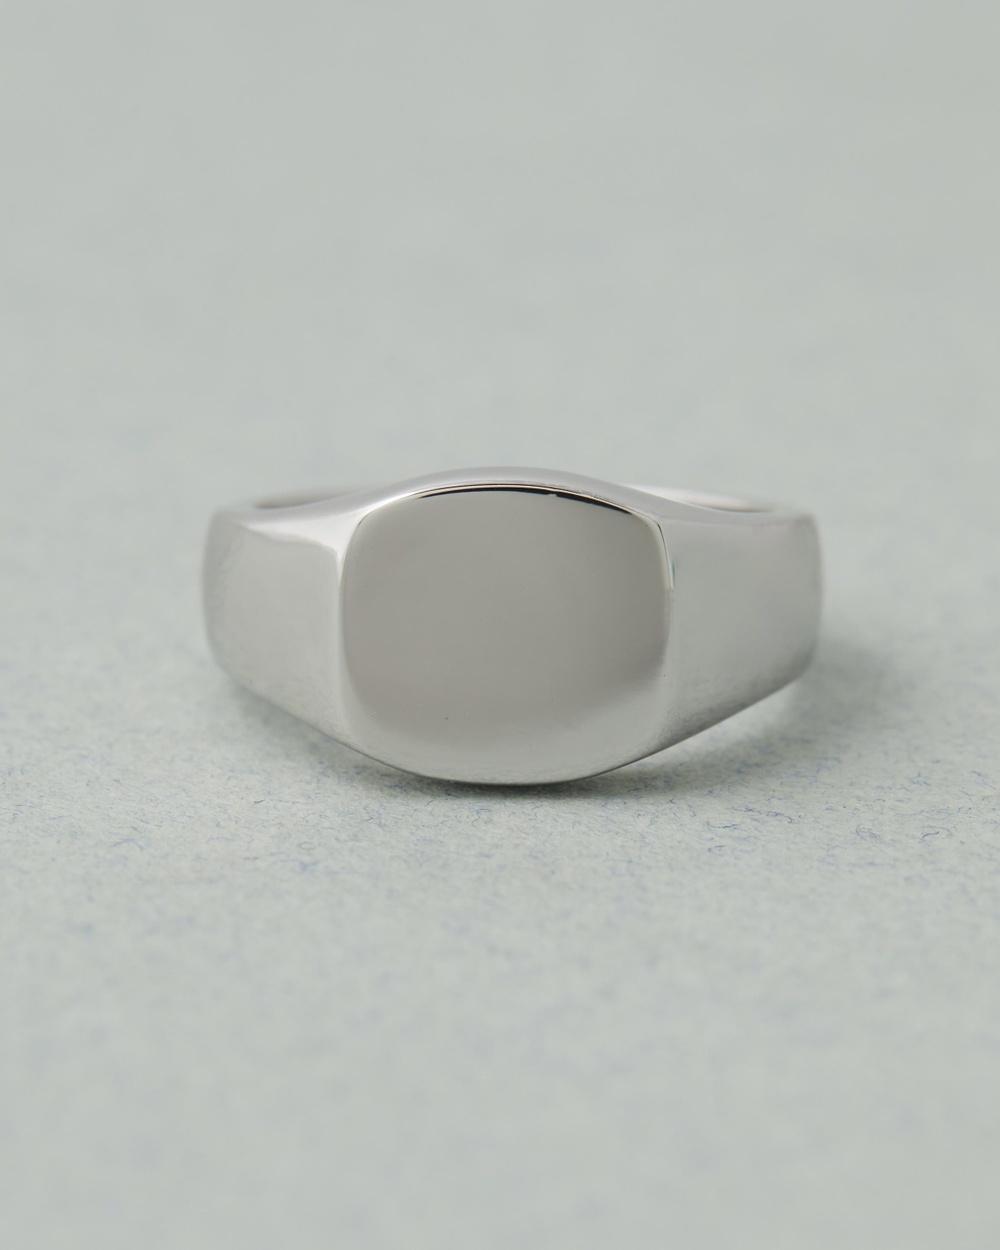 Serge DeNimes Signet Ring Jewellery Silver